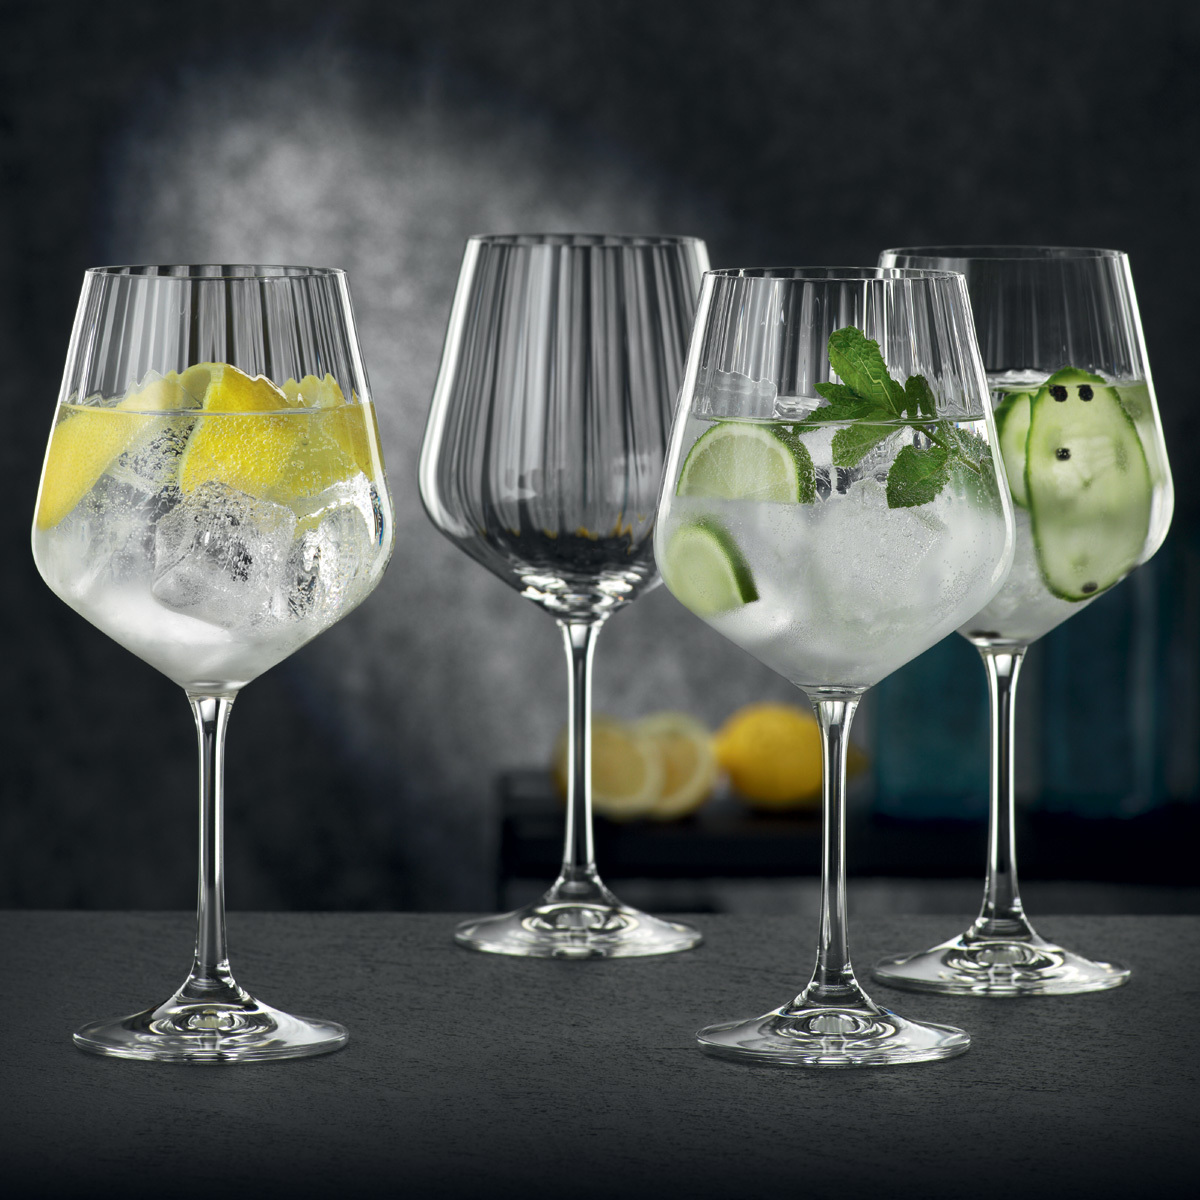 Фото - Набор из 4-х бокалов для коктейлей Nachtmann Gin&Tonic, 640 мл набор бокалов для коктейлей sea life